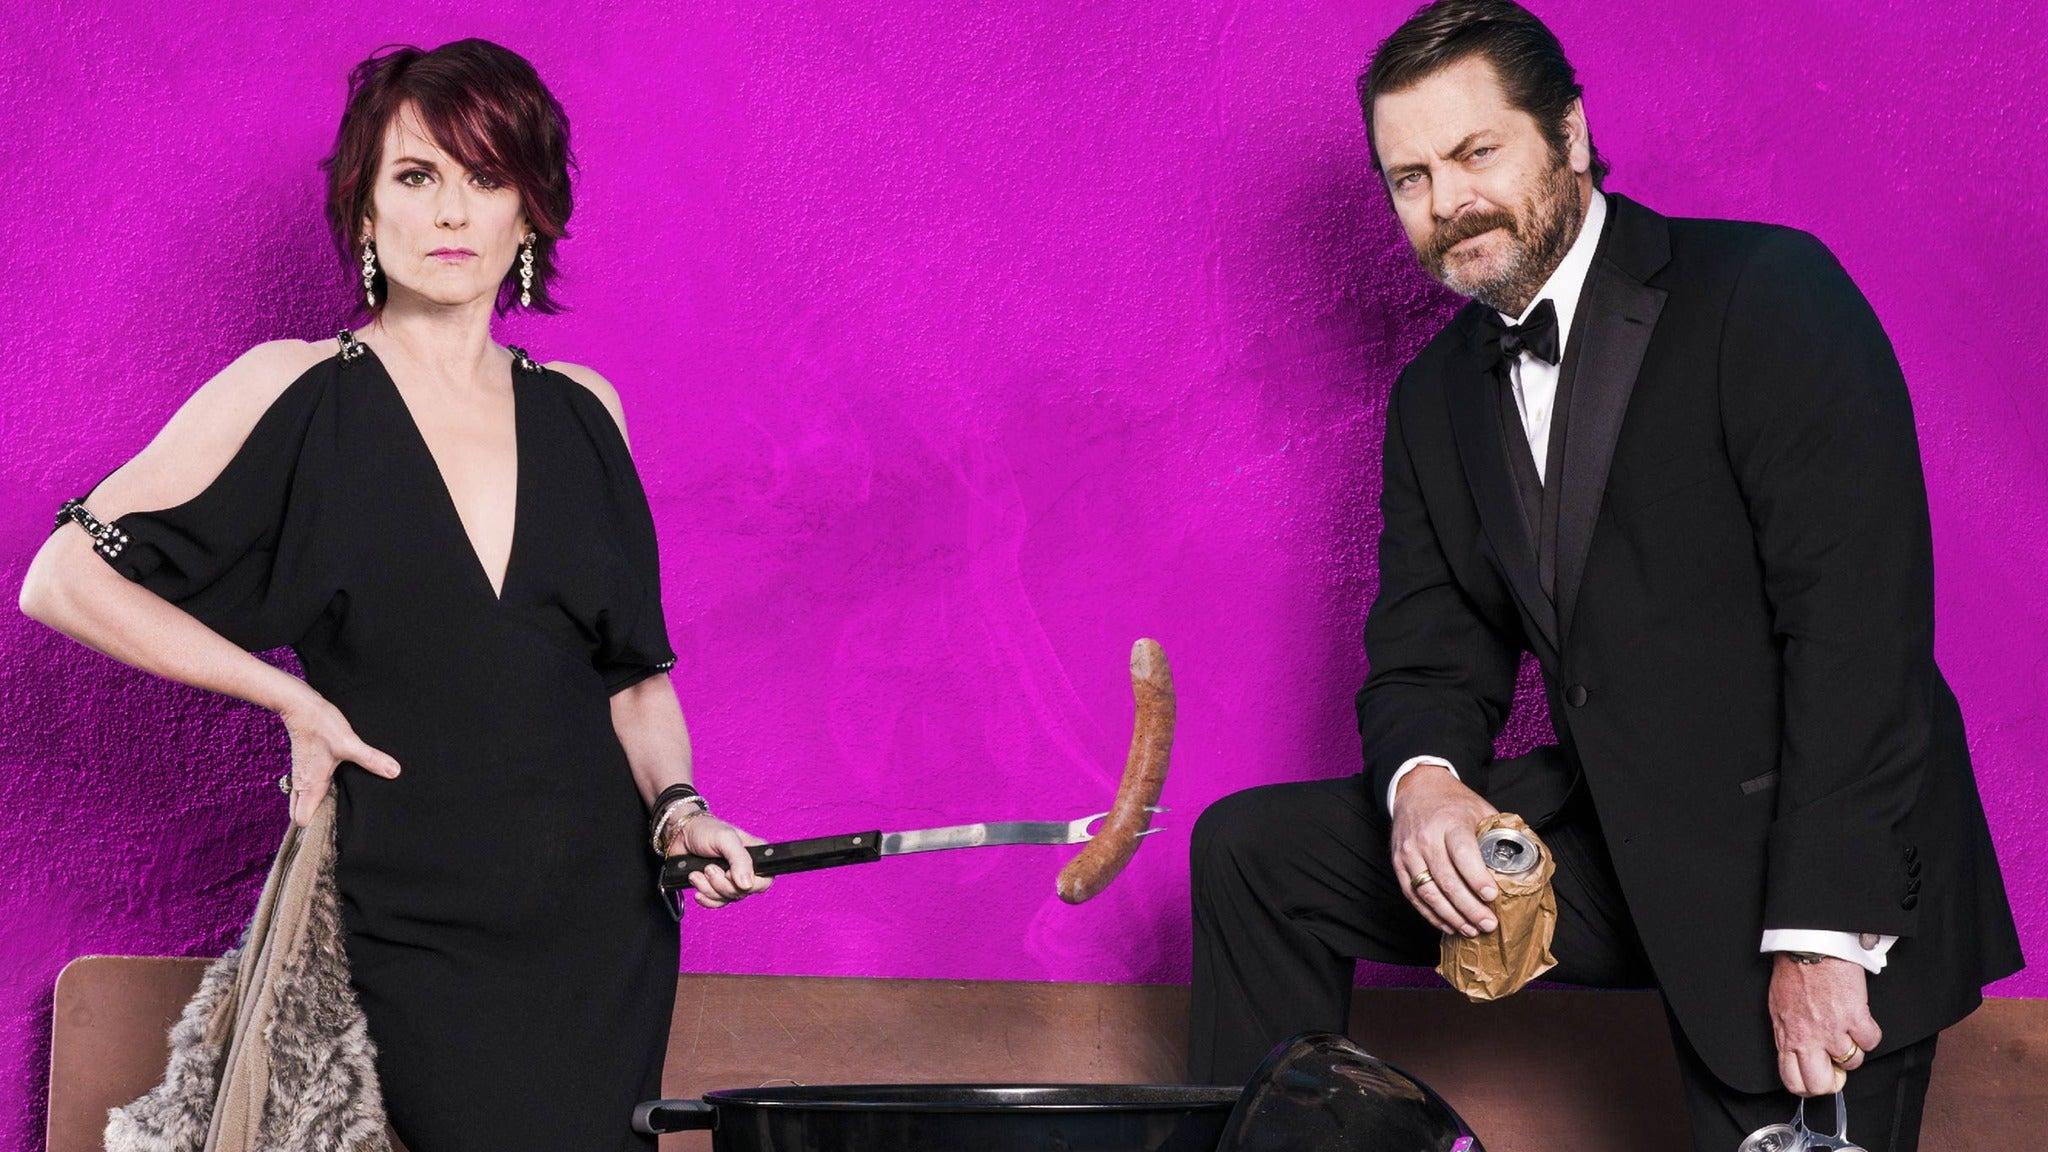 Nick Offerman & Megan Mullally